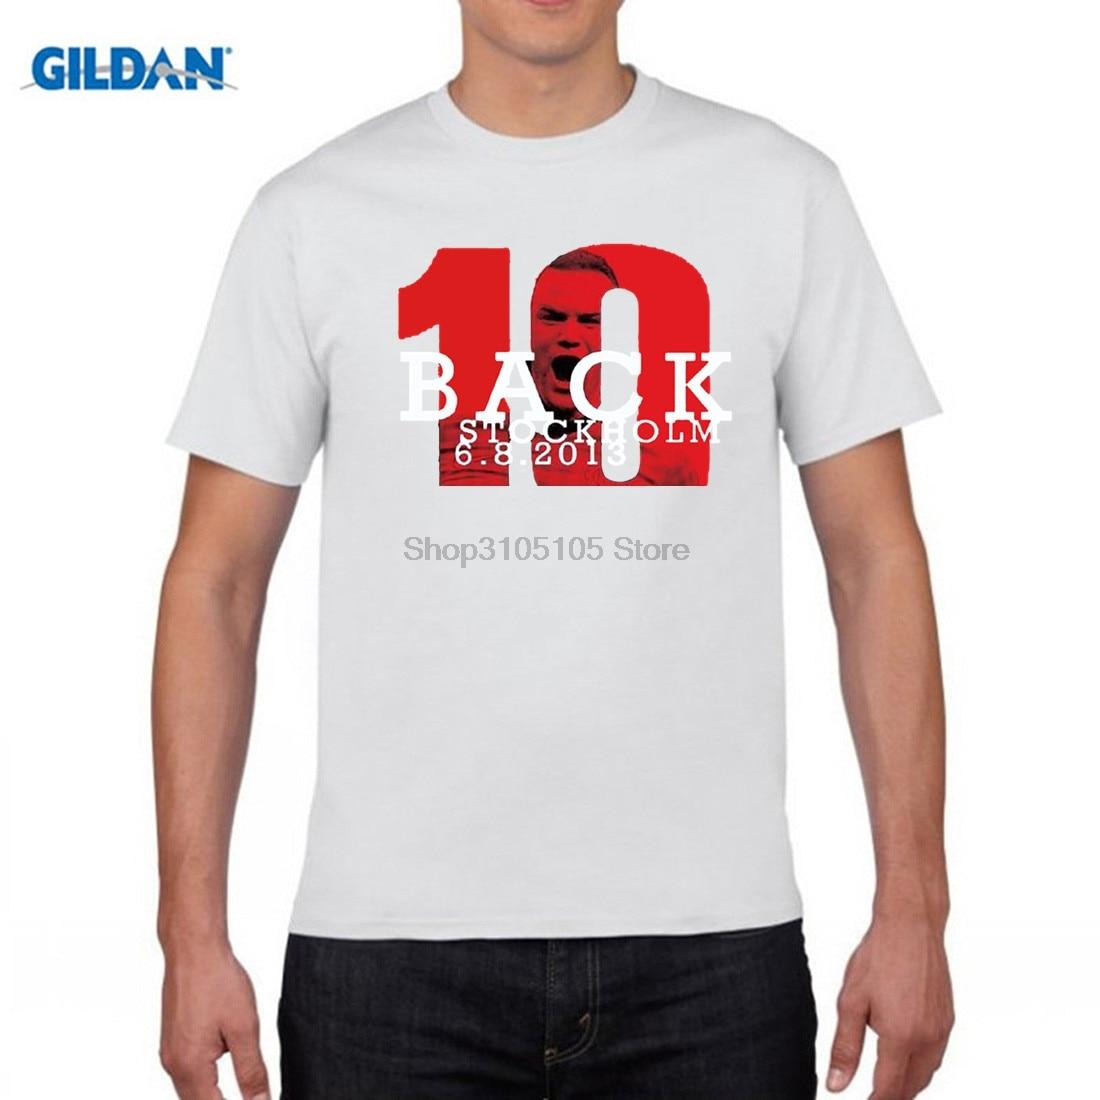 GILDAN Wayne Rooney England Everton Premier League The Red Devils 100% cotton jersey 253 goals